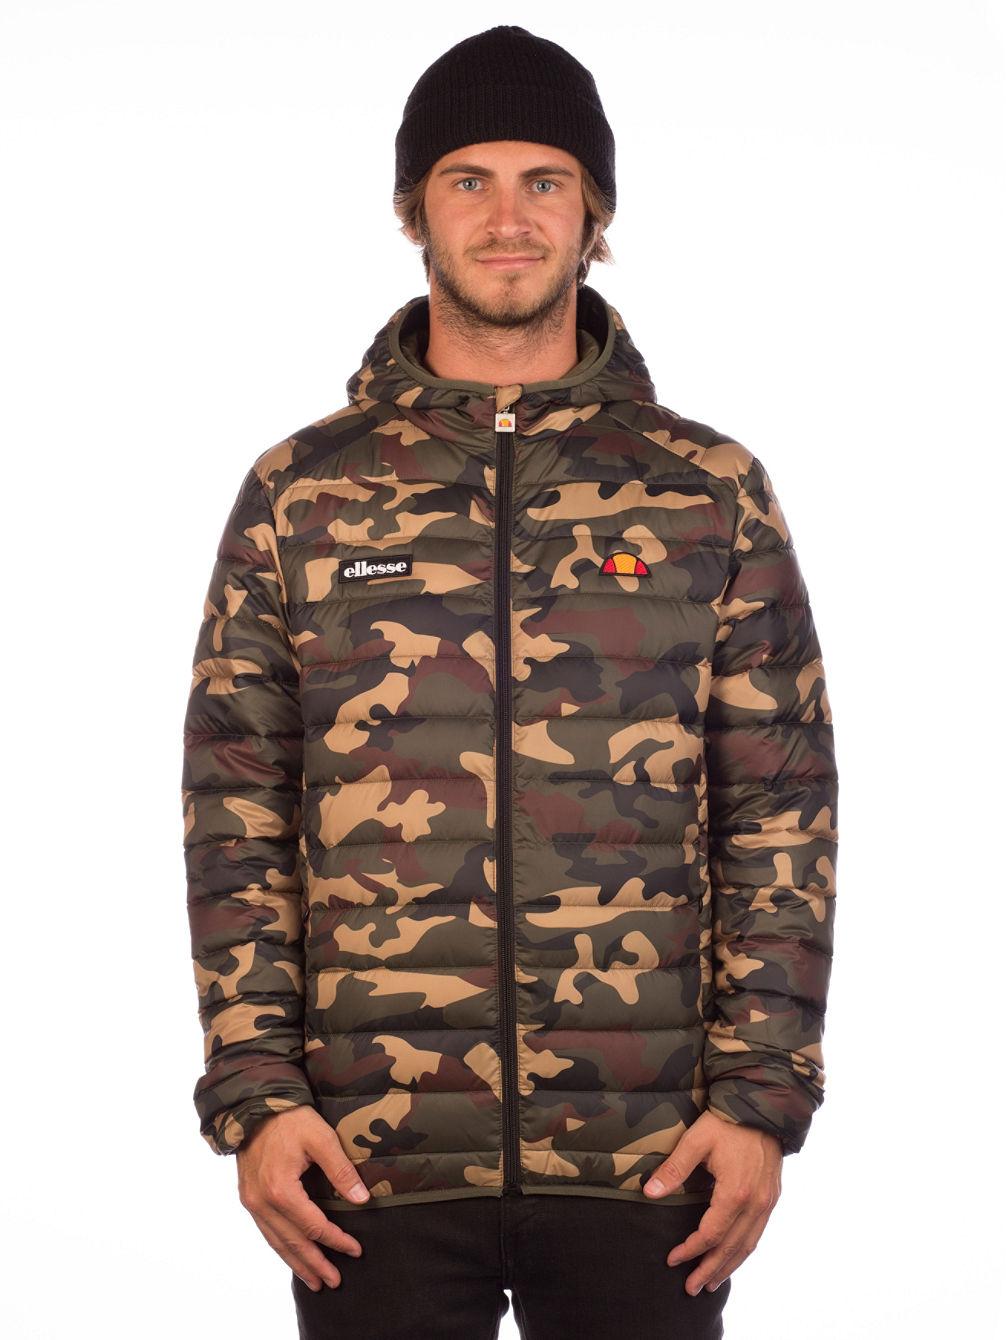 online kinder heiß-verkaufendes echtes Lombardy Jacke